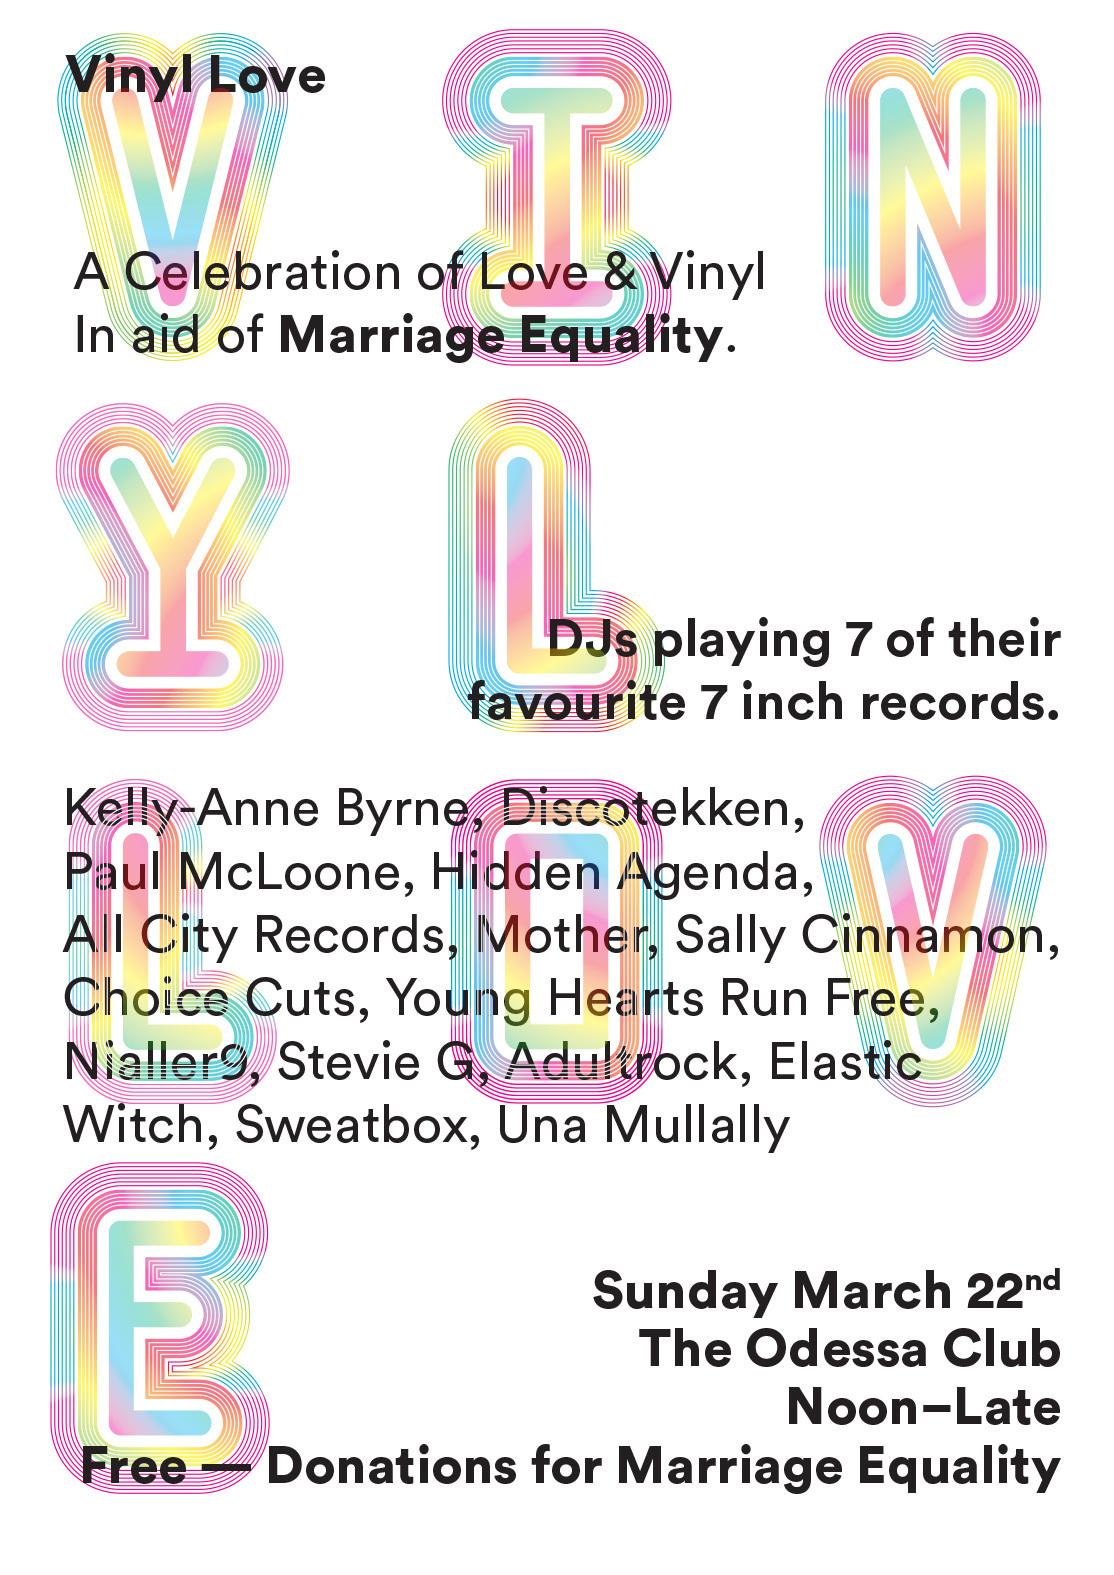 VinylLove_Poster_Print-2_1114